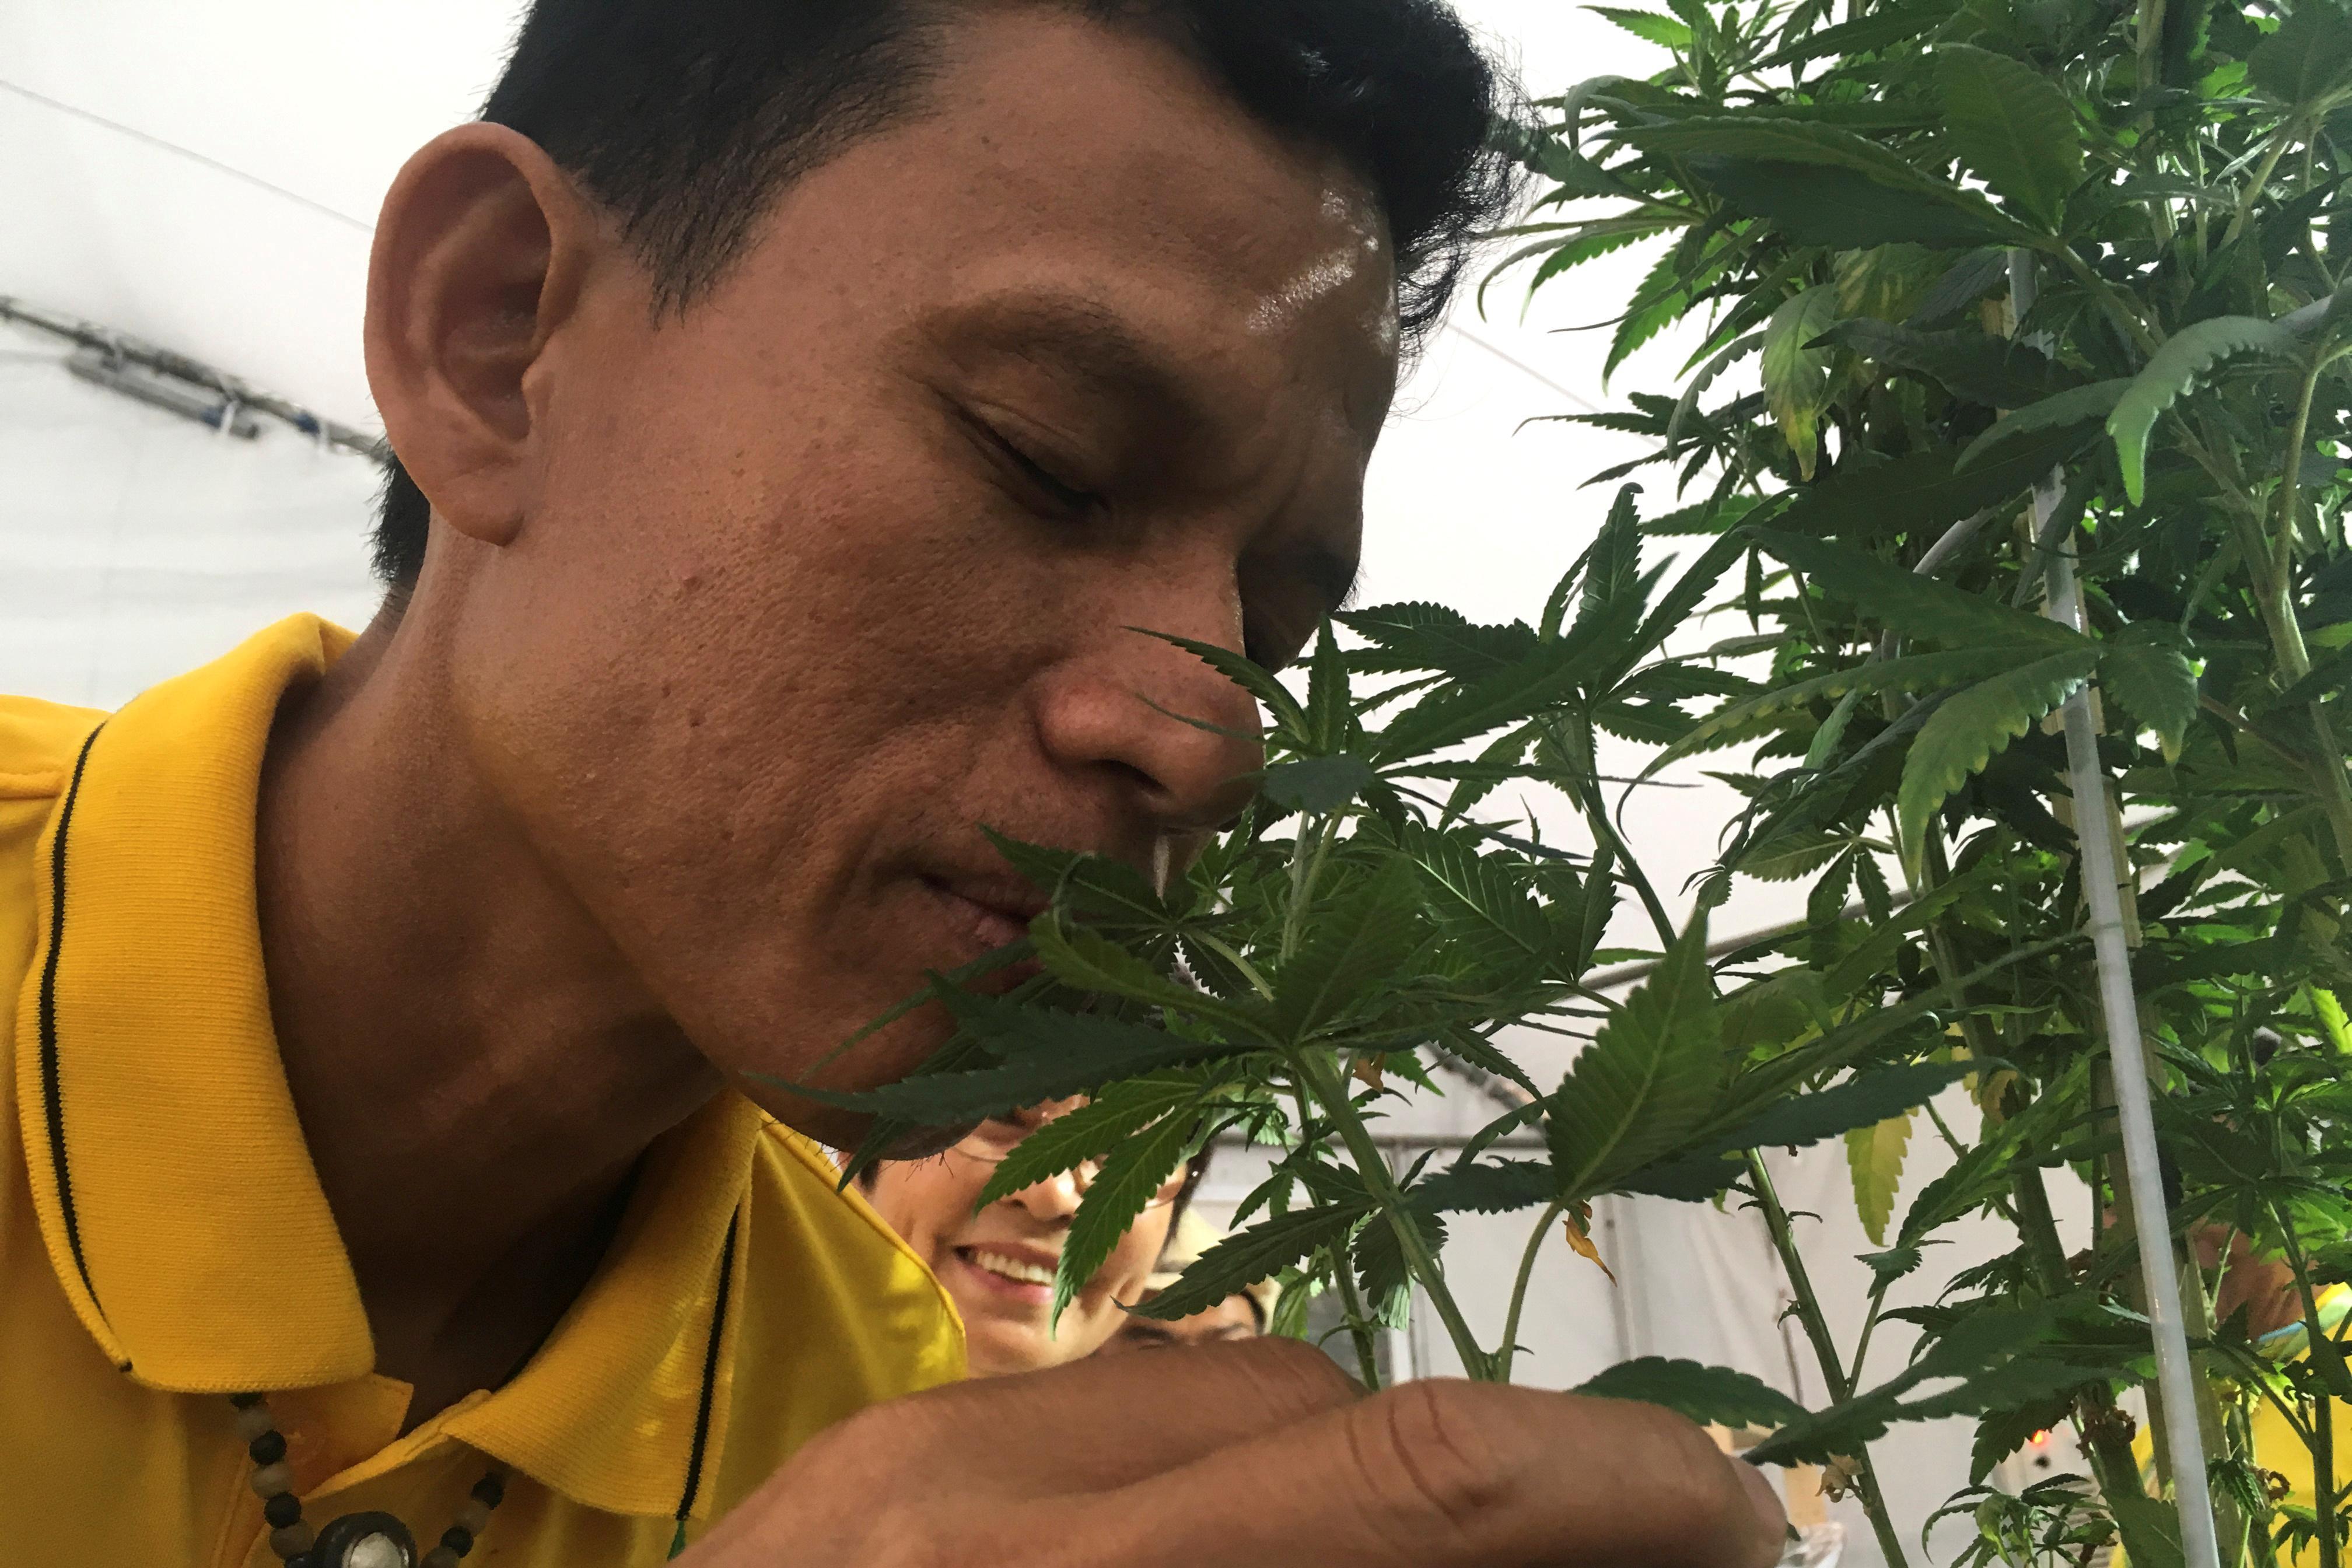 Thais allowed six cannabis plants per household under draft law